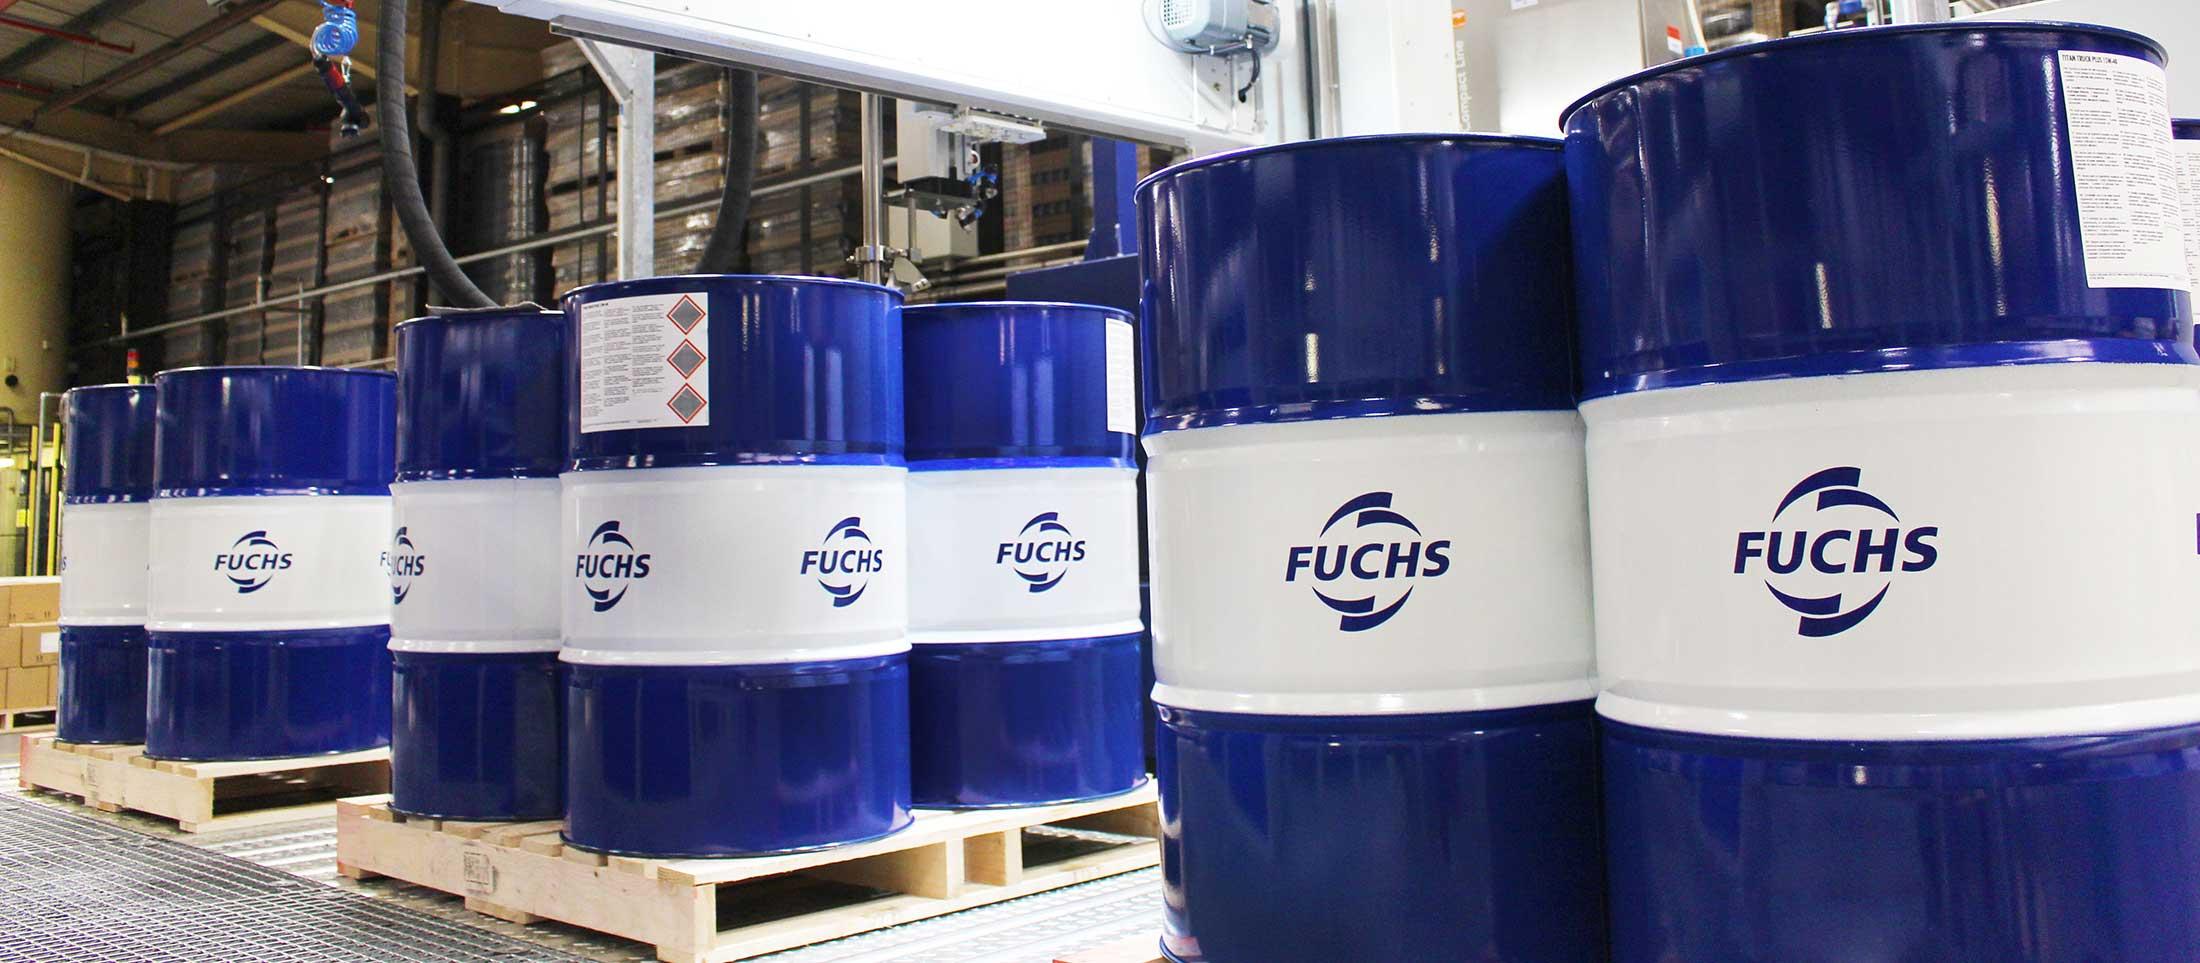 fuchs lubricant barrels on pallets